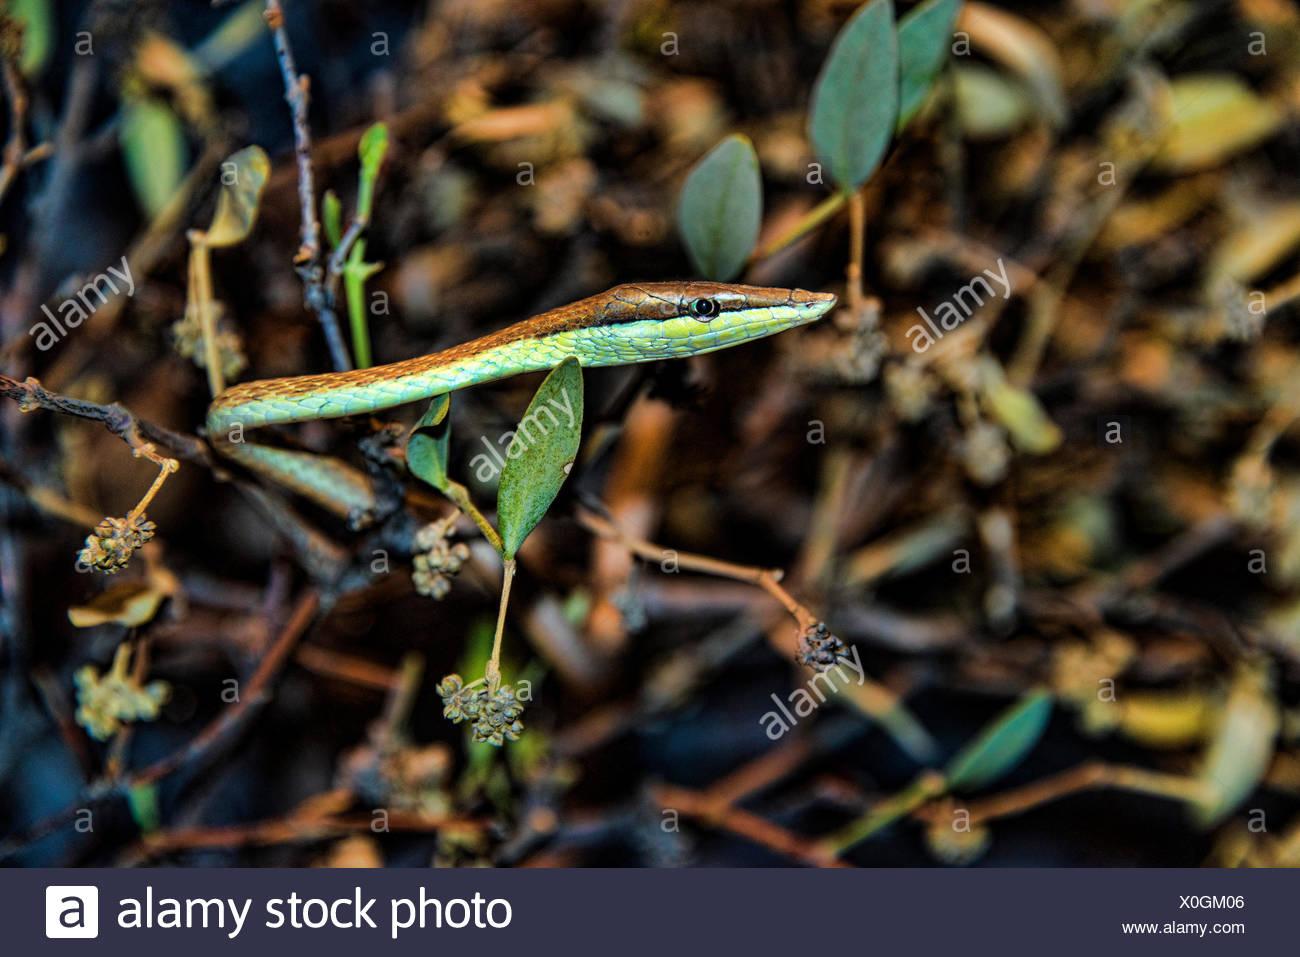 brown vine snake, Oxybelis aeneus, snake, reptile, animal - Stock Image